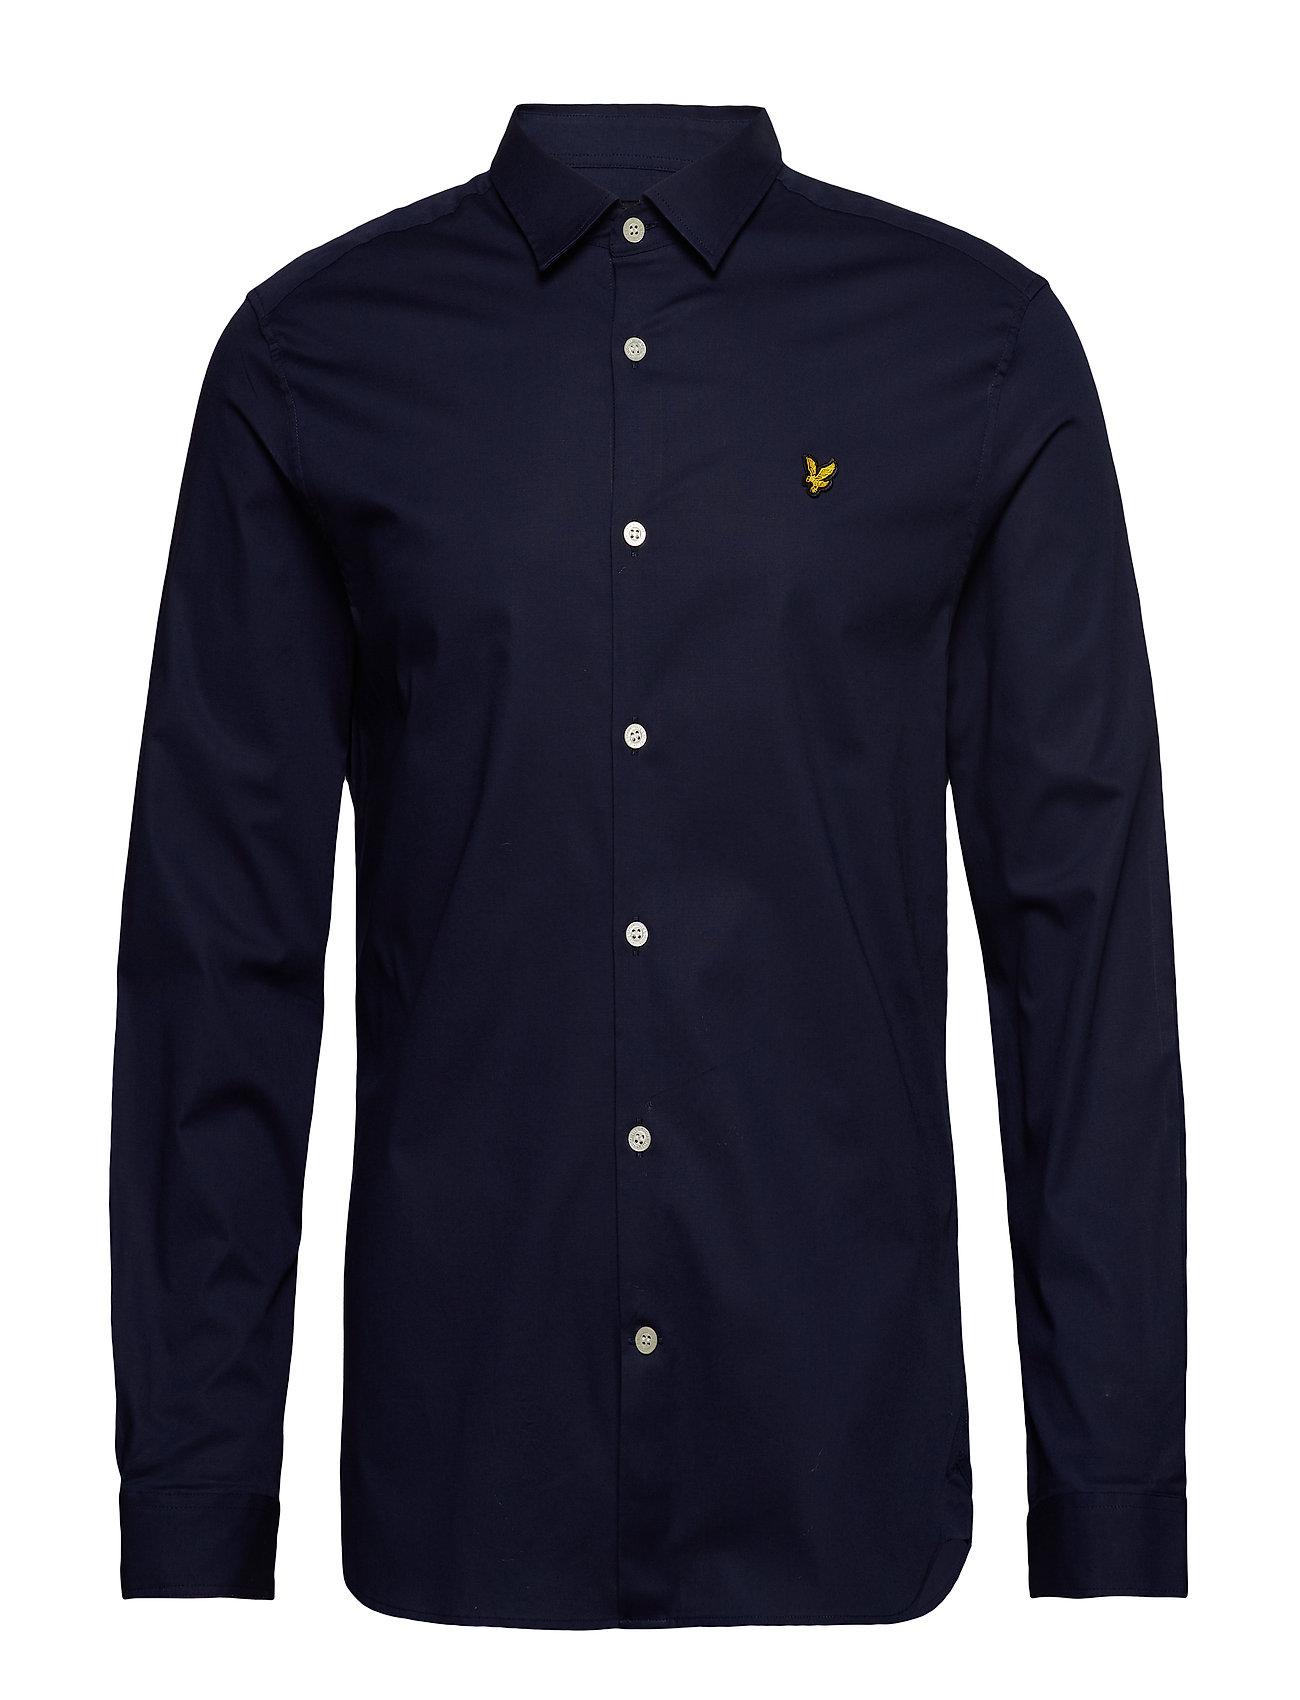 Lyle & Scott LS Slim Fit Poplin Shirt - NAVY